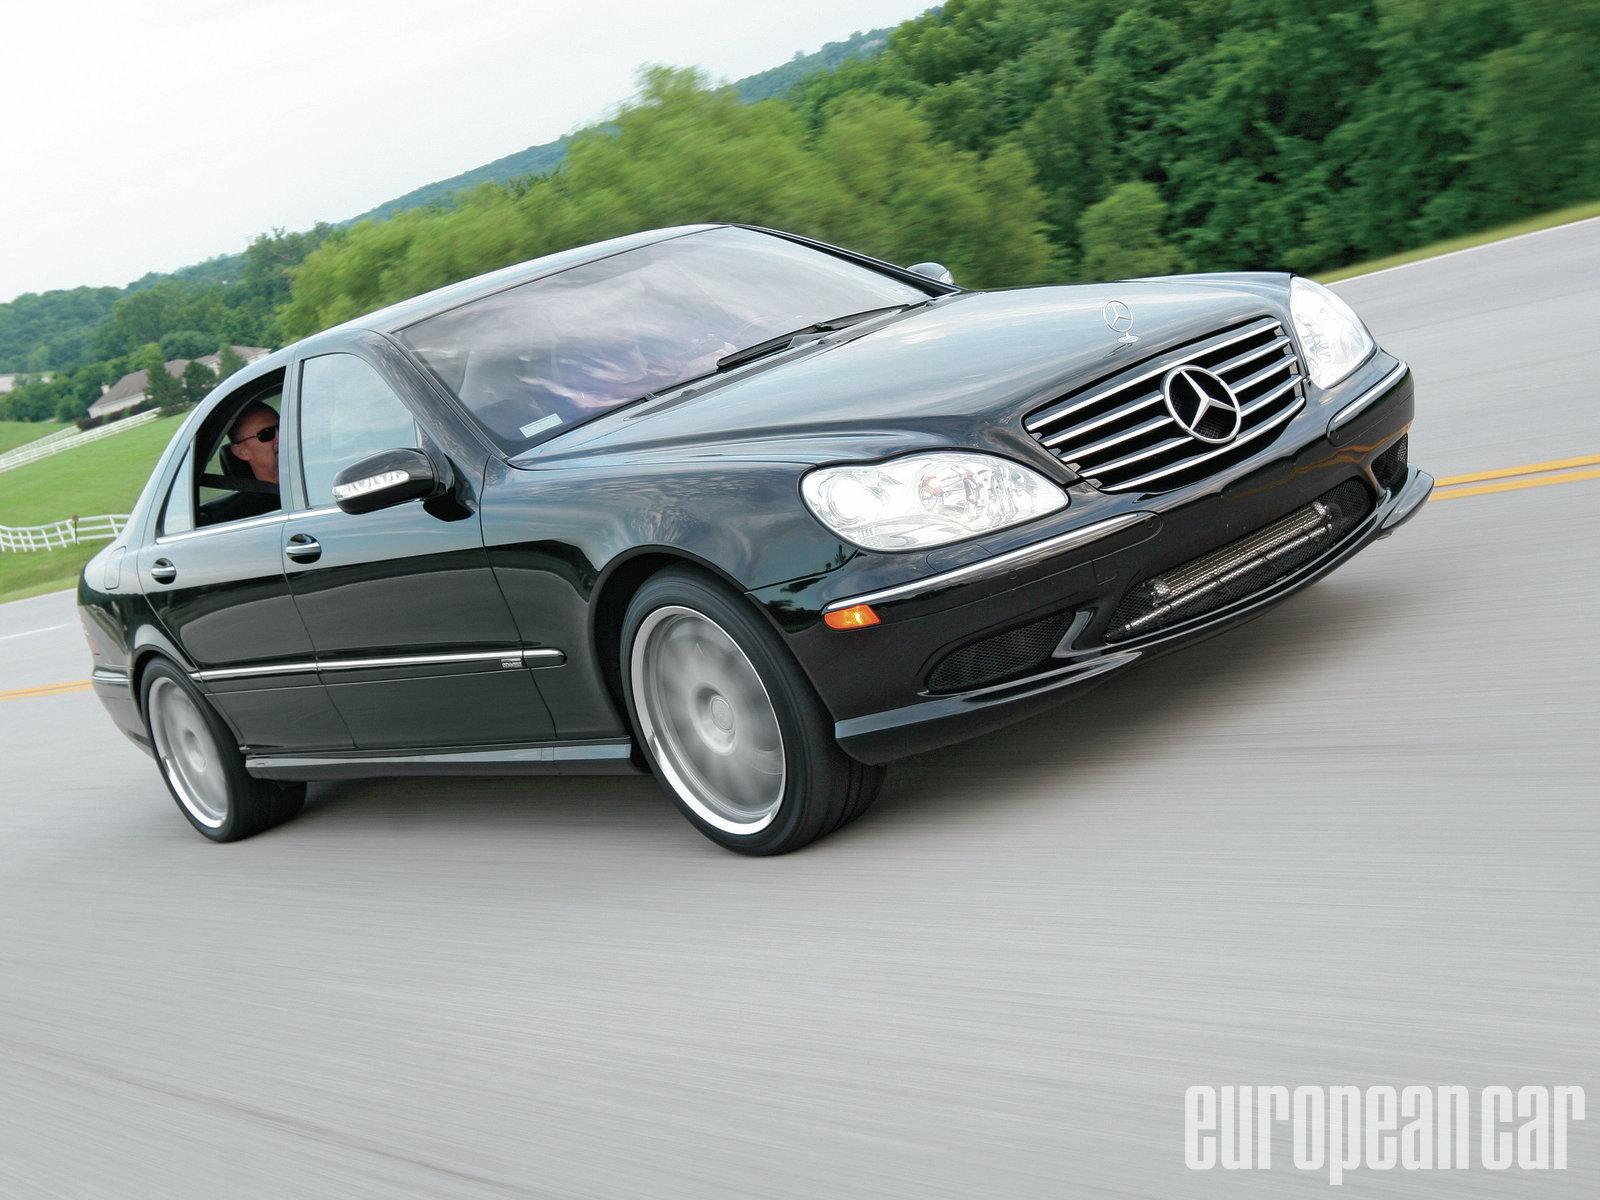 2003 Mercedes Benz S600 - Proven - European Car Magazine